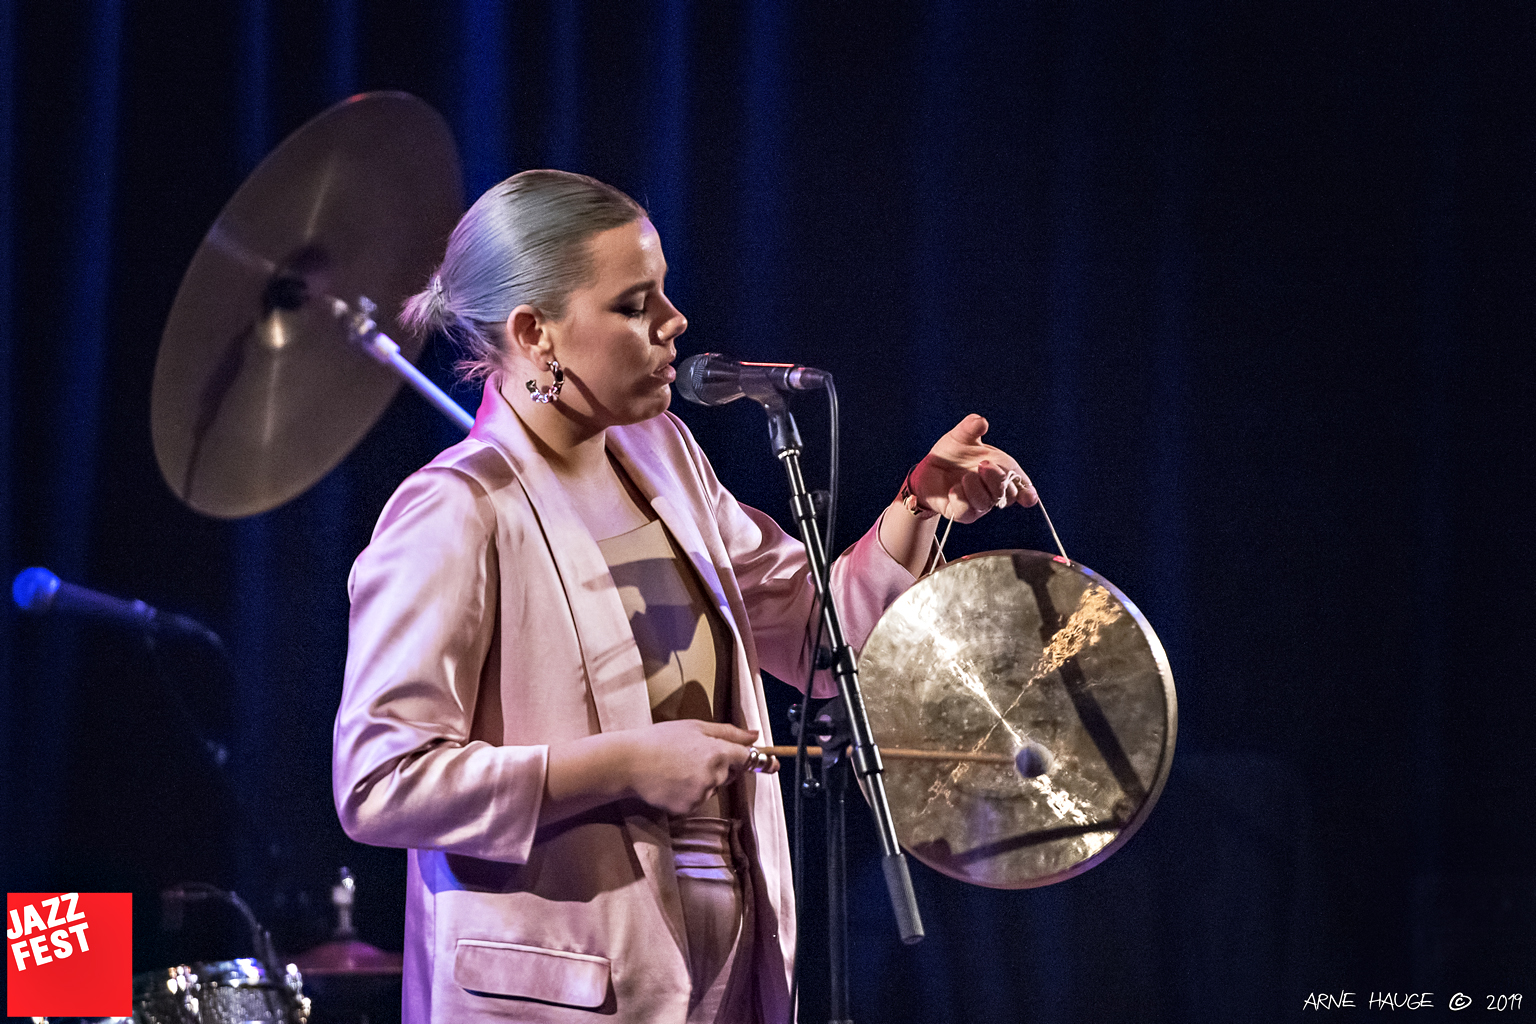 190510 Natalie Sandtorv (Jazz Expo) @ Dokkhuset - foto Arne Hauge_008.jpg